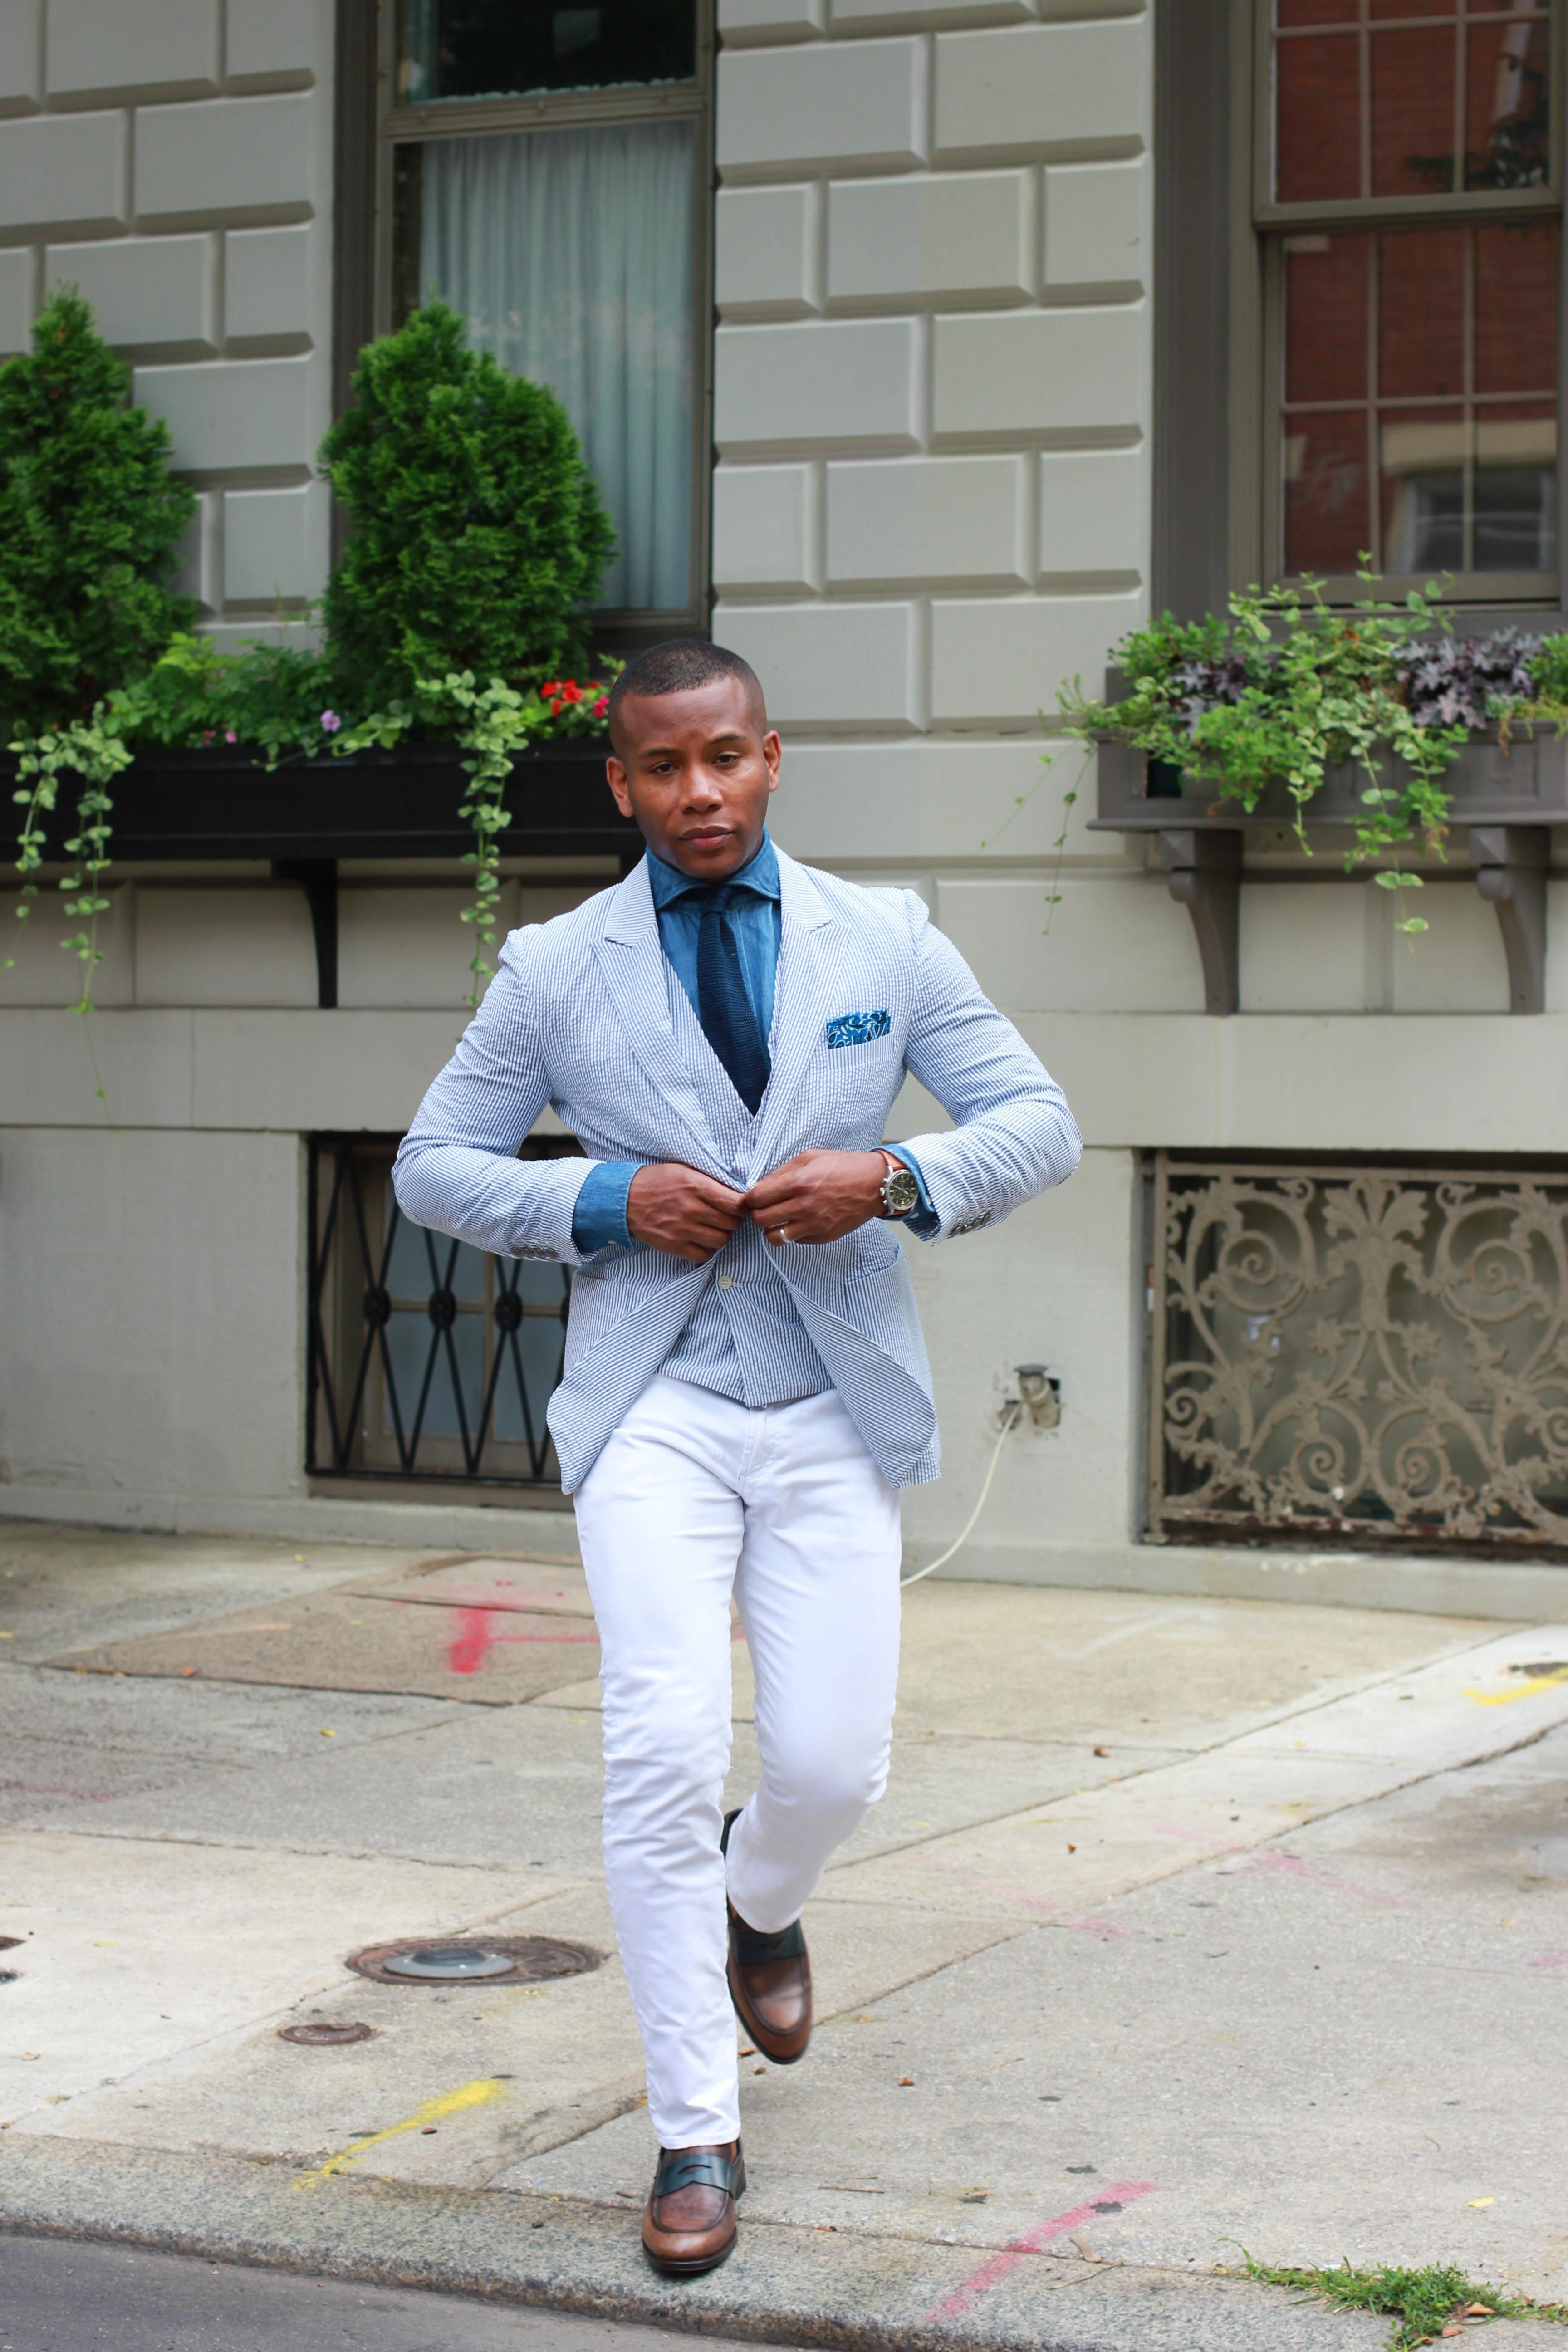 Sabir M. Peele in Tailor 4 Less Seersucker Suit